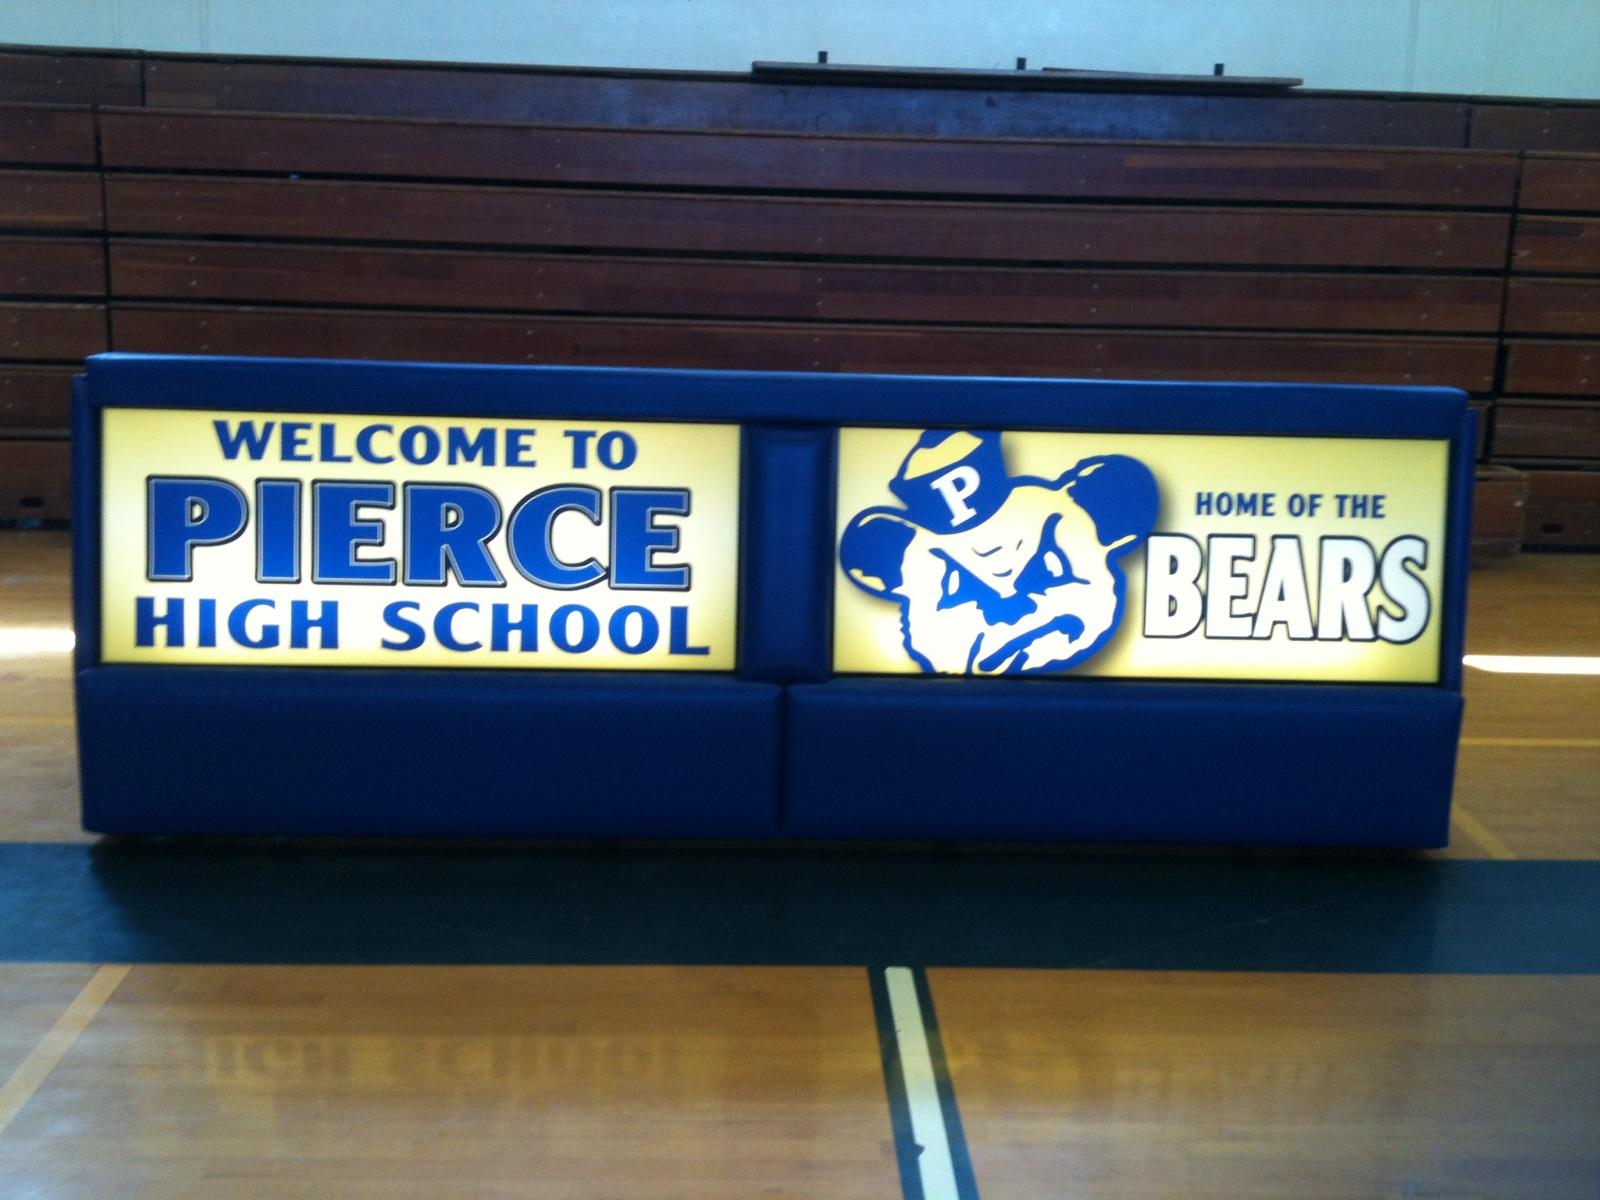 Pierce High School